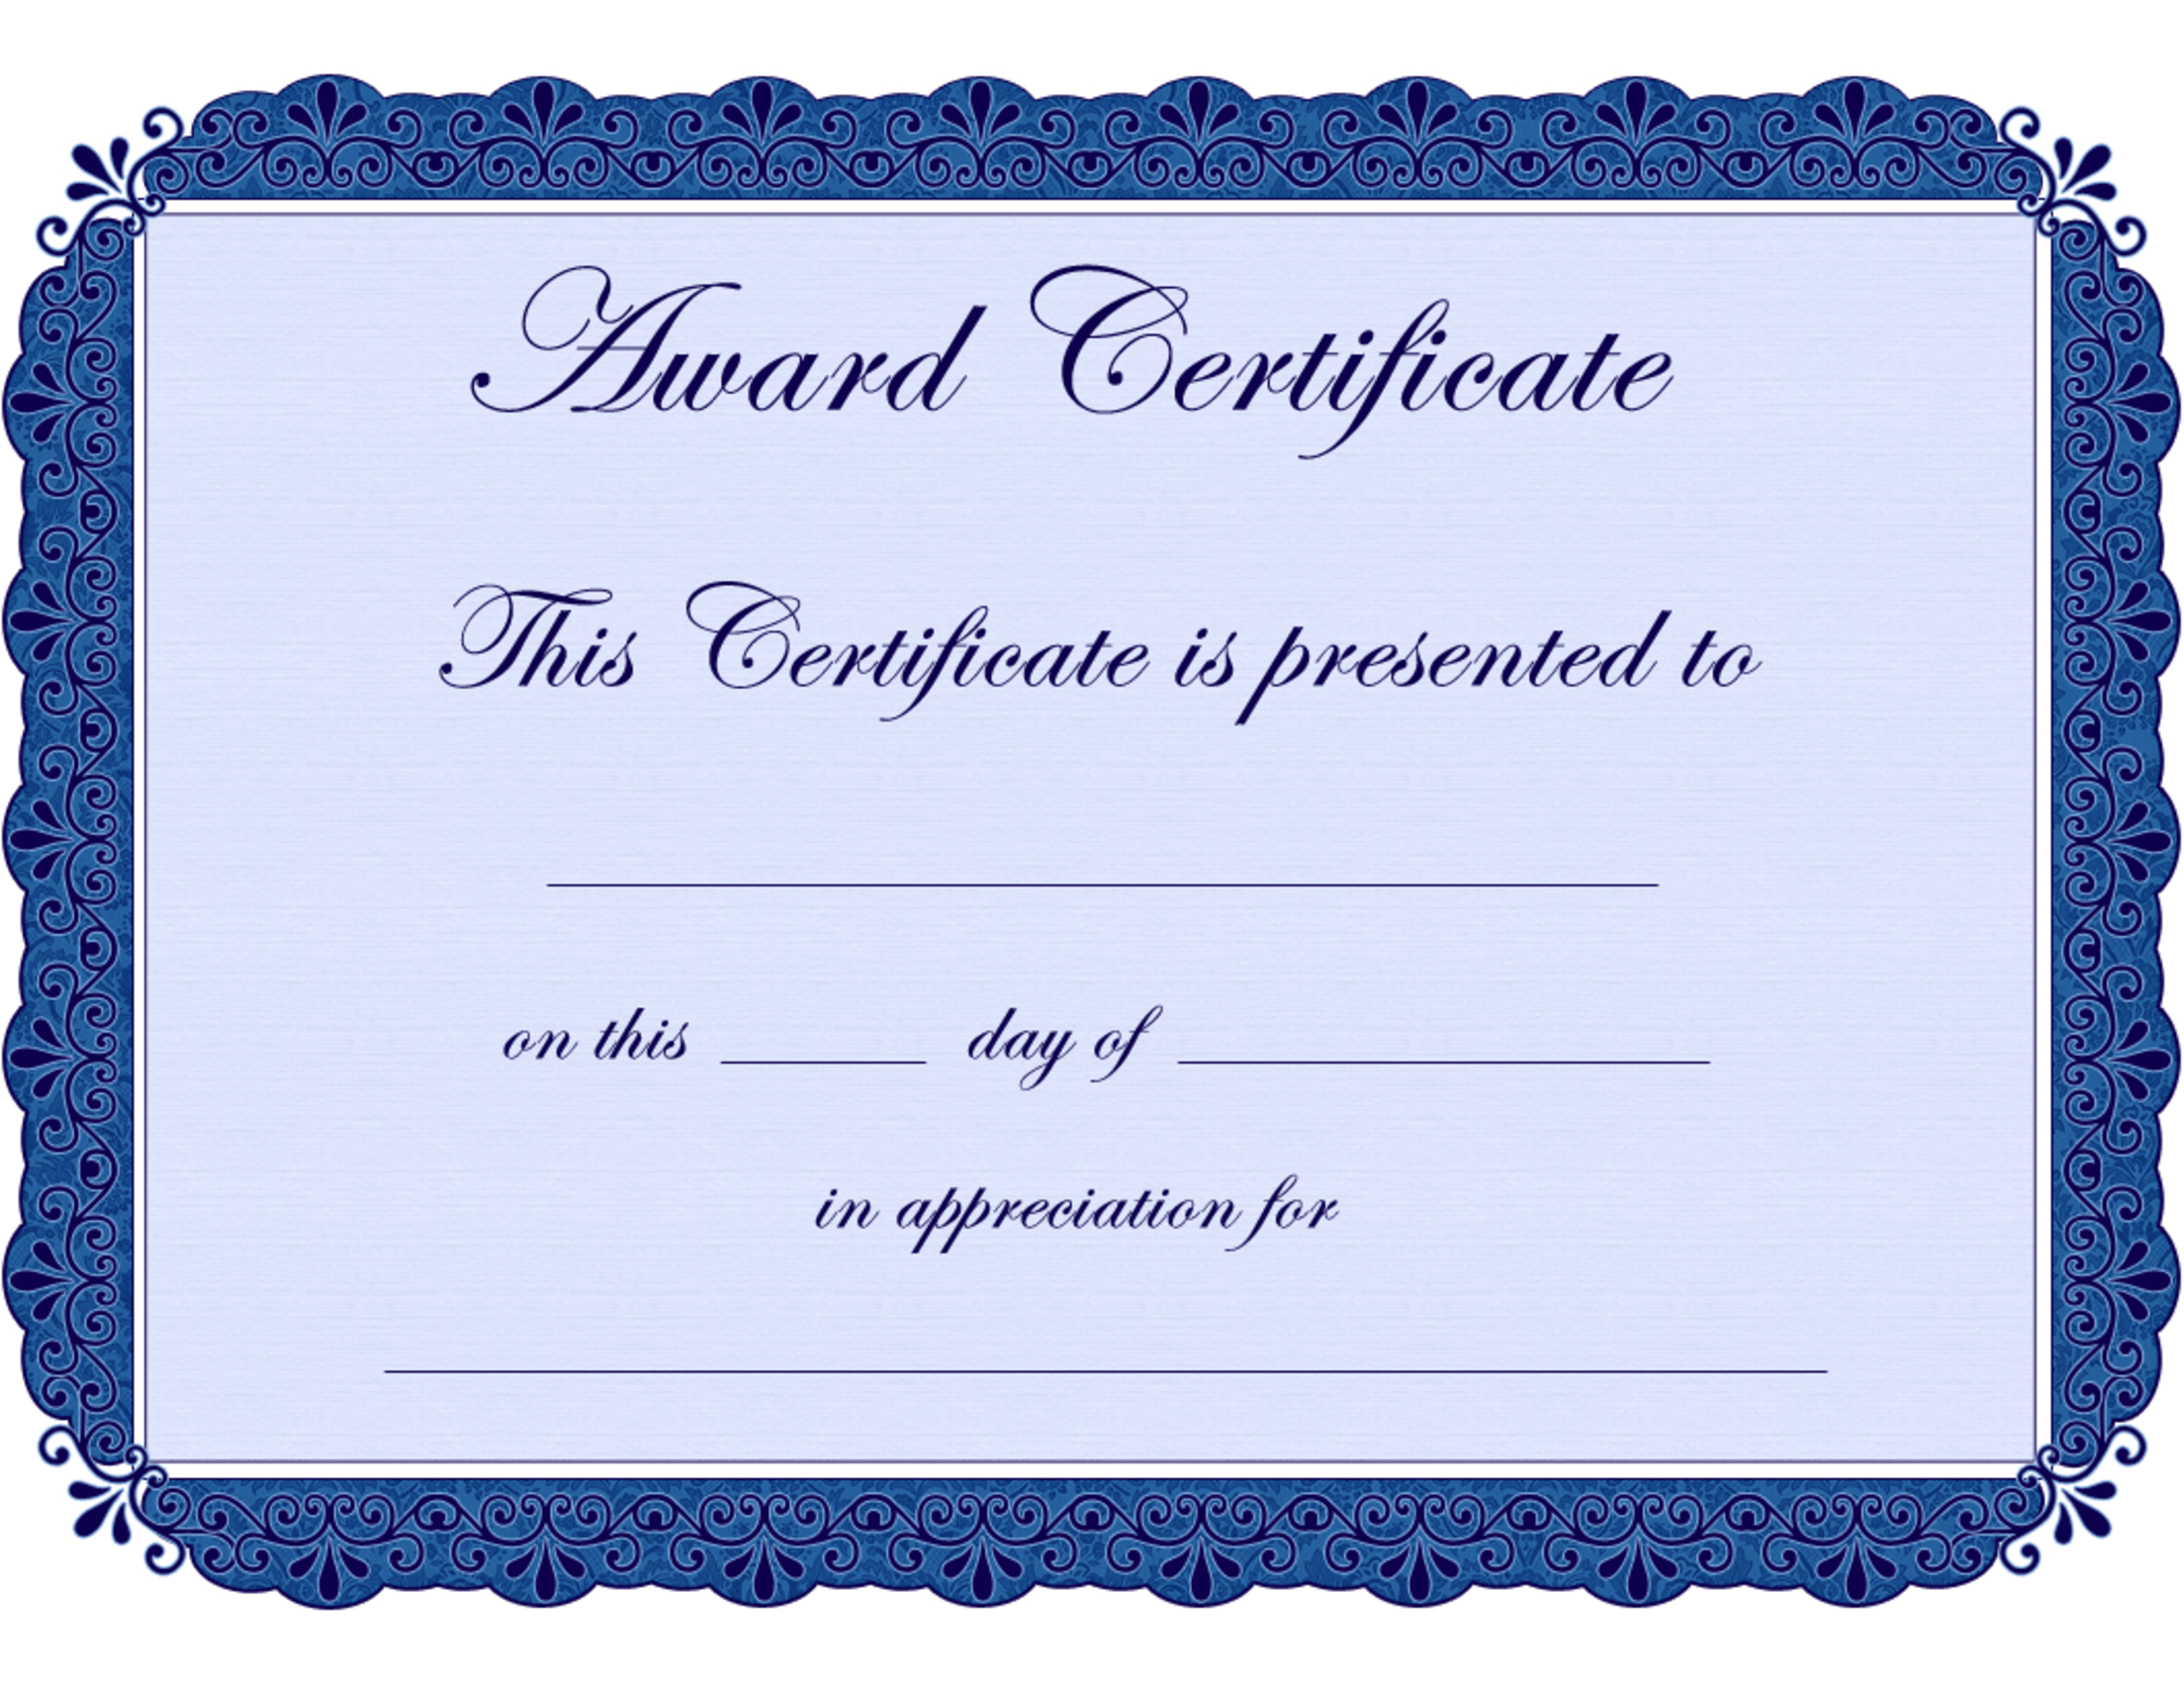 Free Printable Award Certificate Borders    Award Certificate - Free Printable Wrestling Certificates